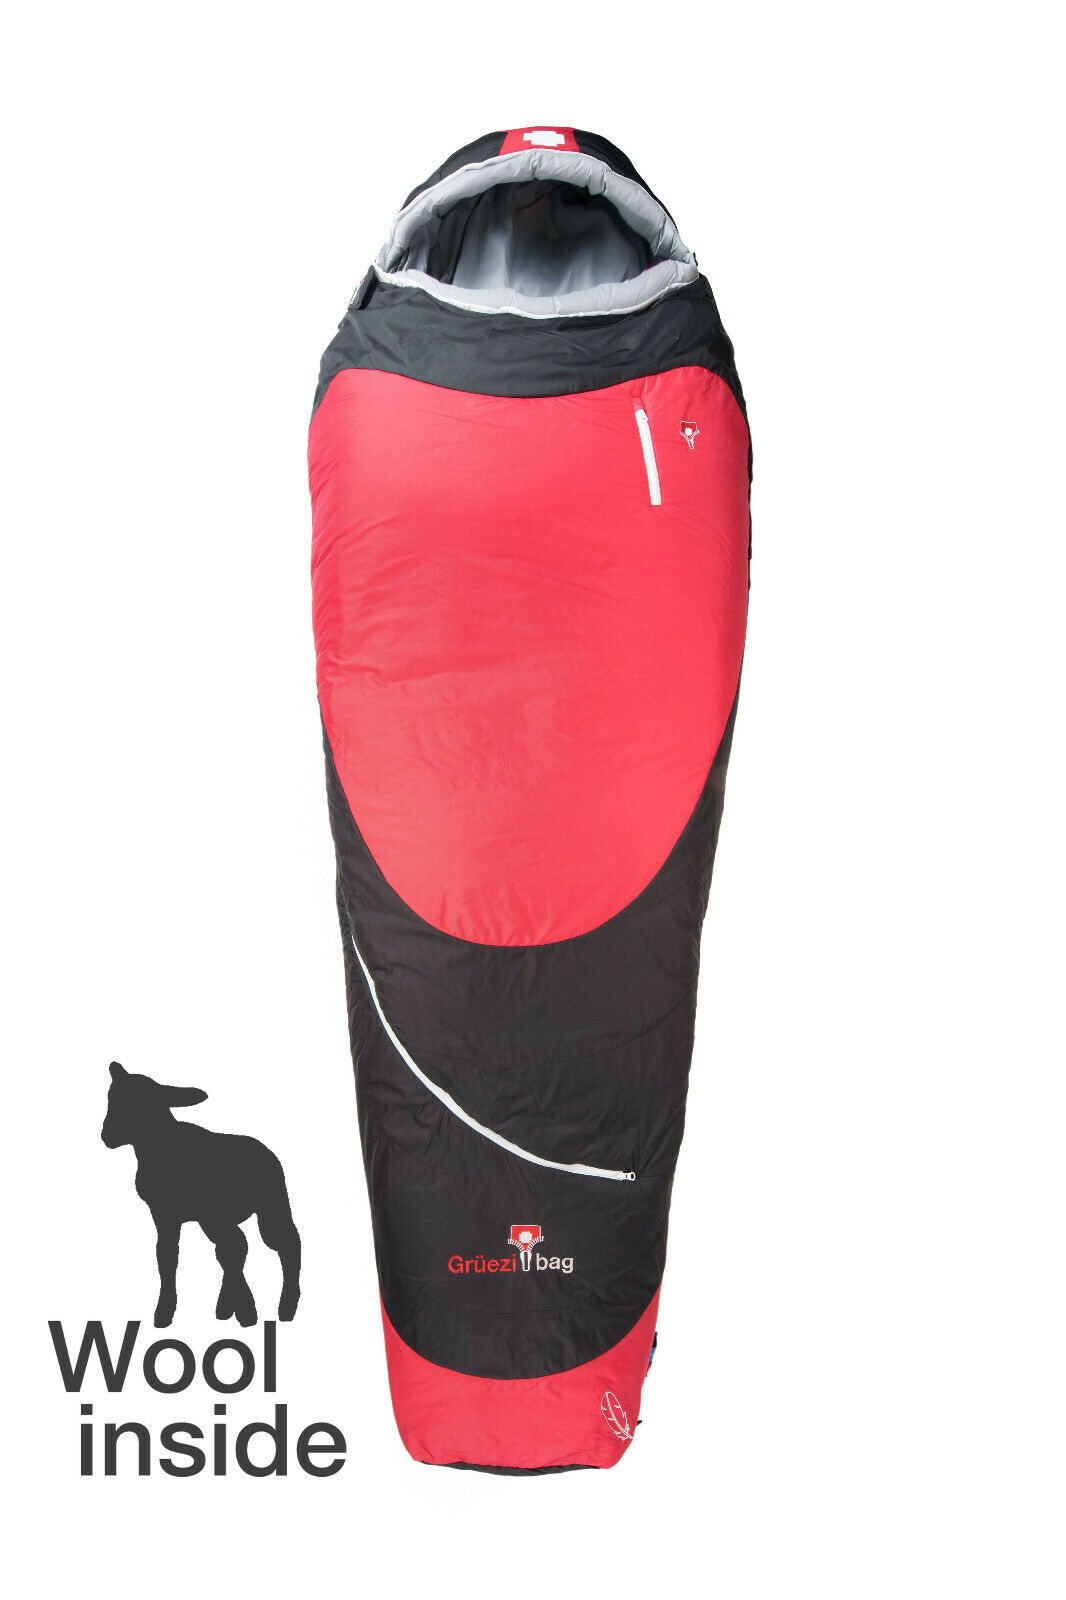 Grüezi Bag Biopod Hybrid Wool/Down 185 / -3°C 1200g grüezibag